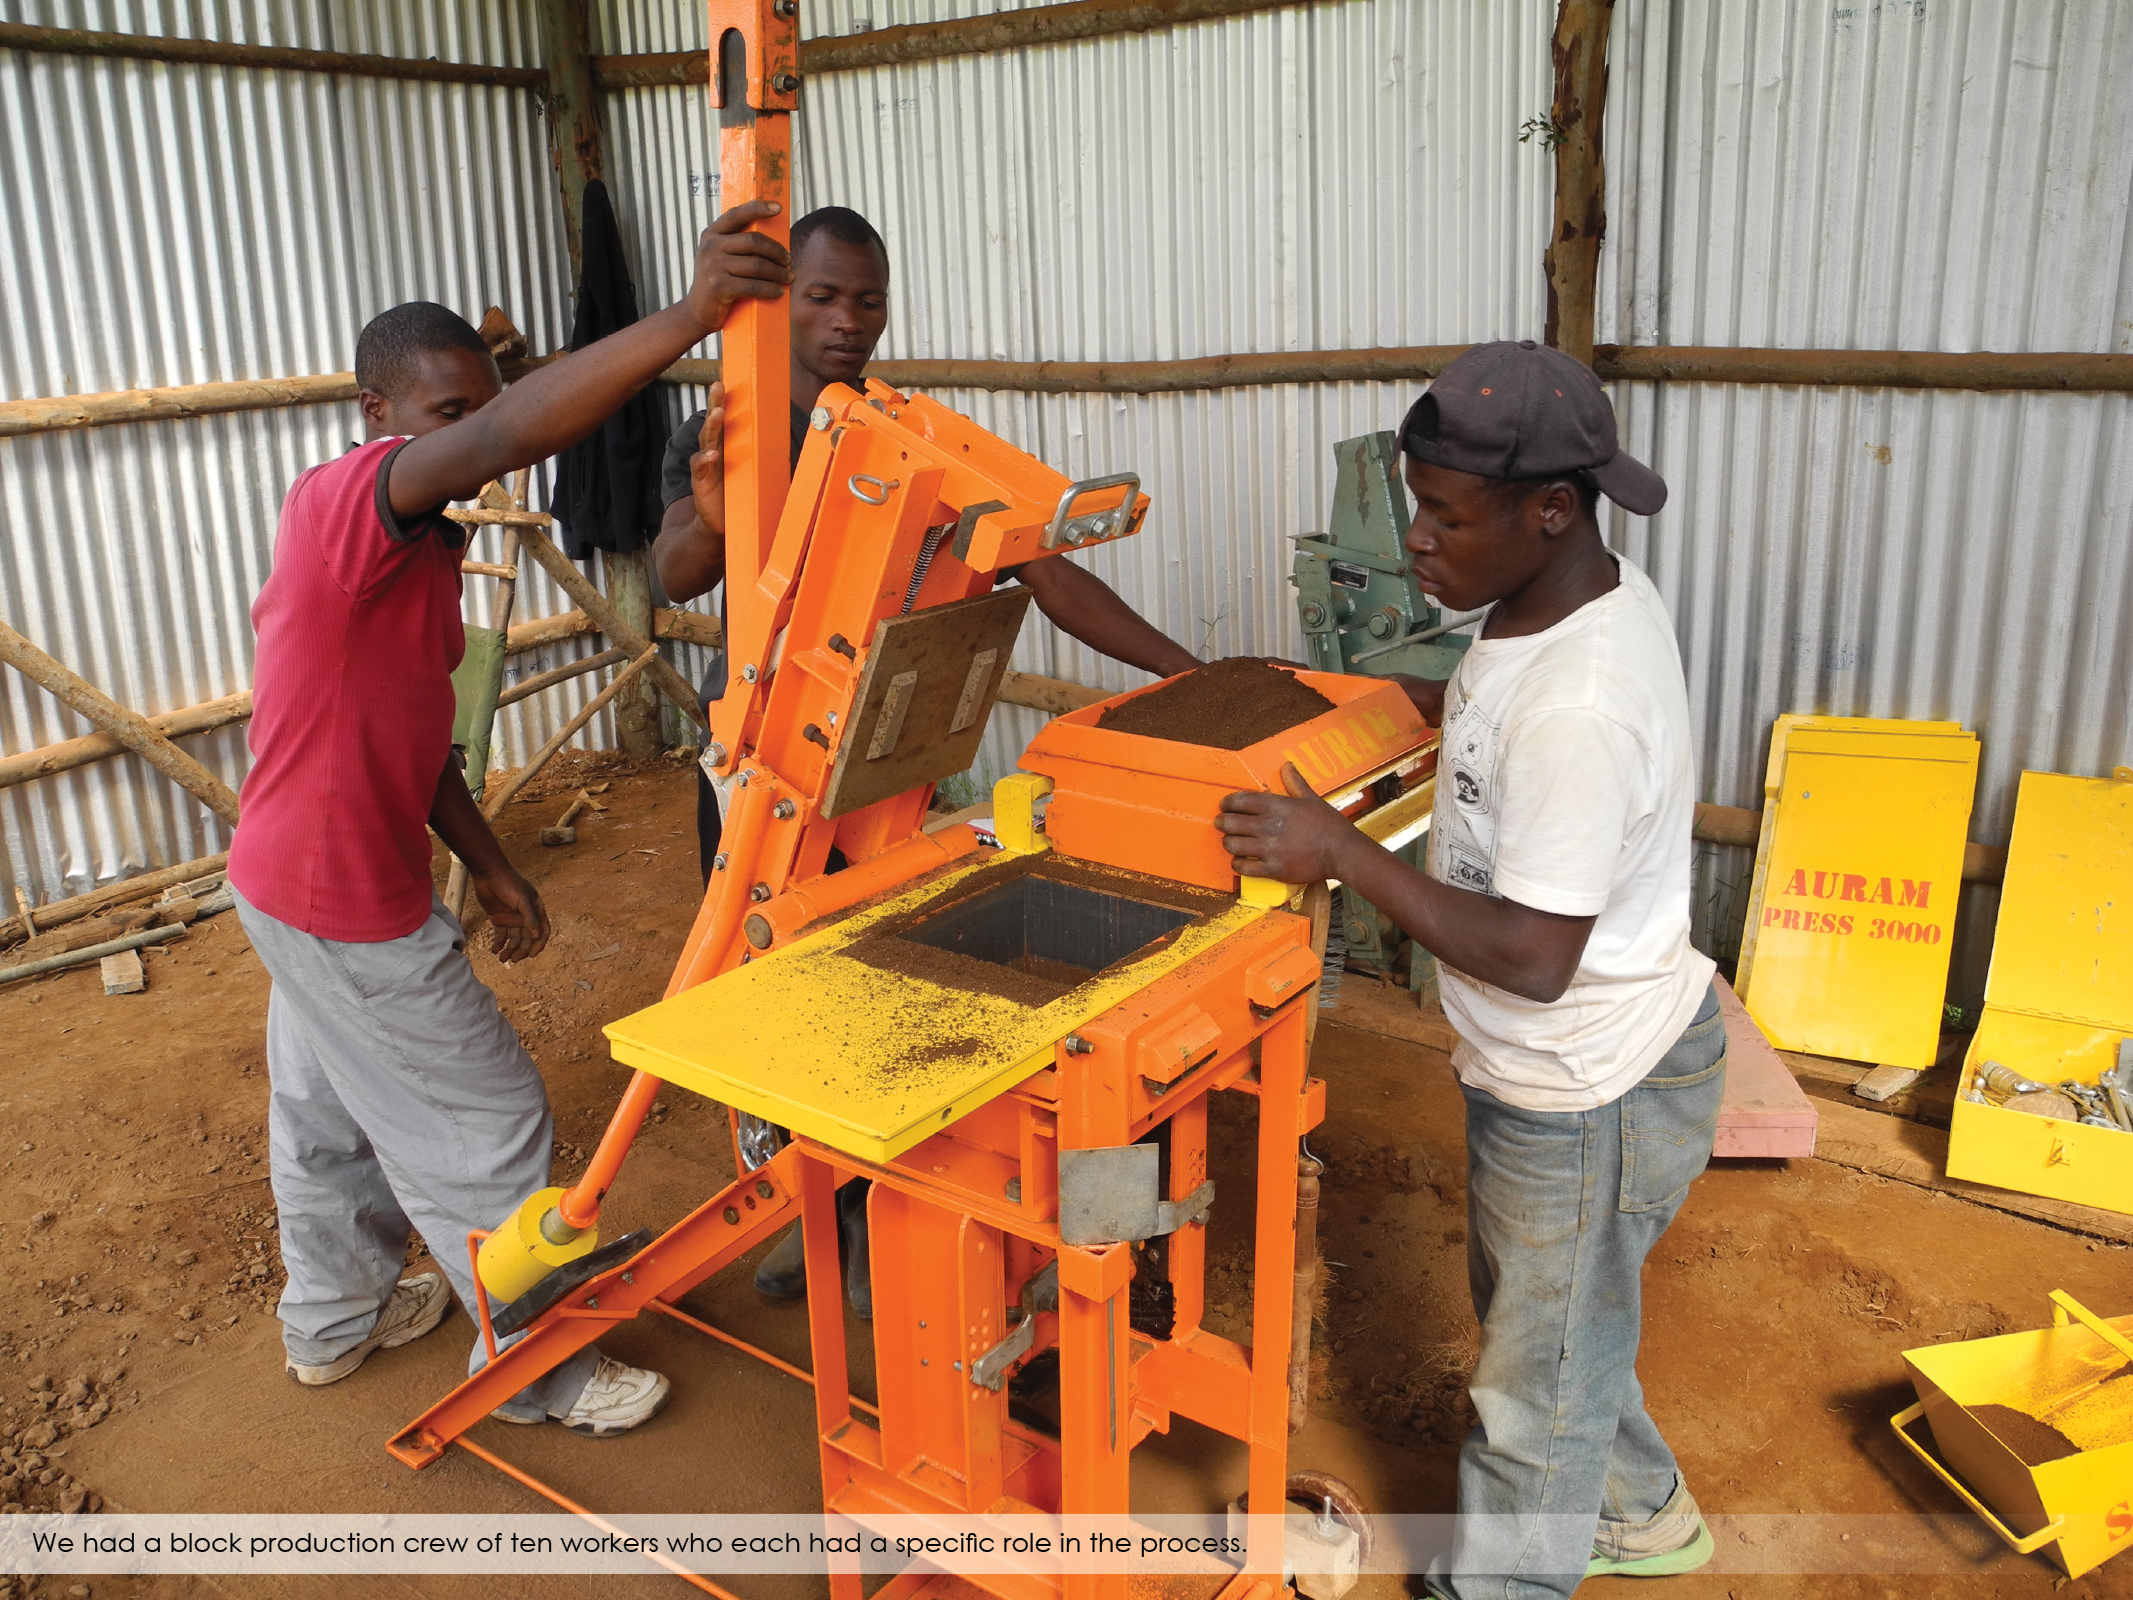 Gaugler_RwandaExperience_p14.jpg